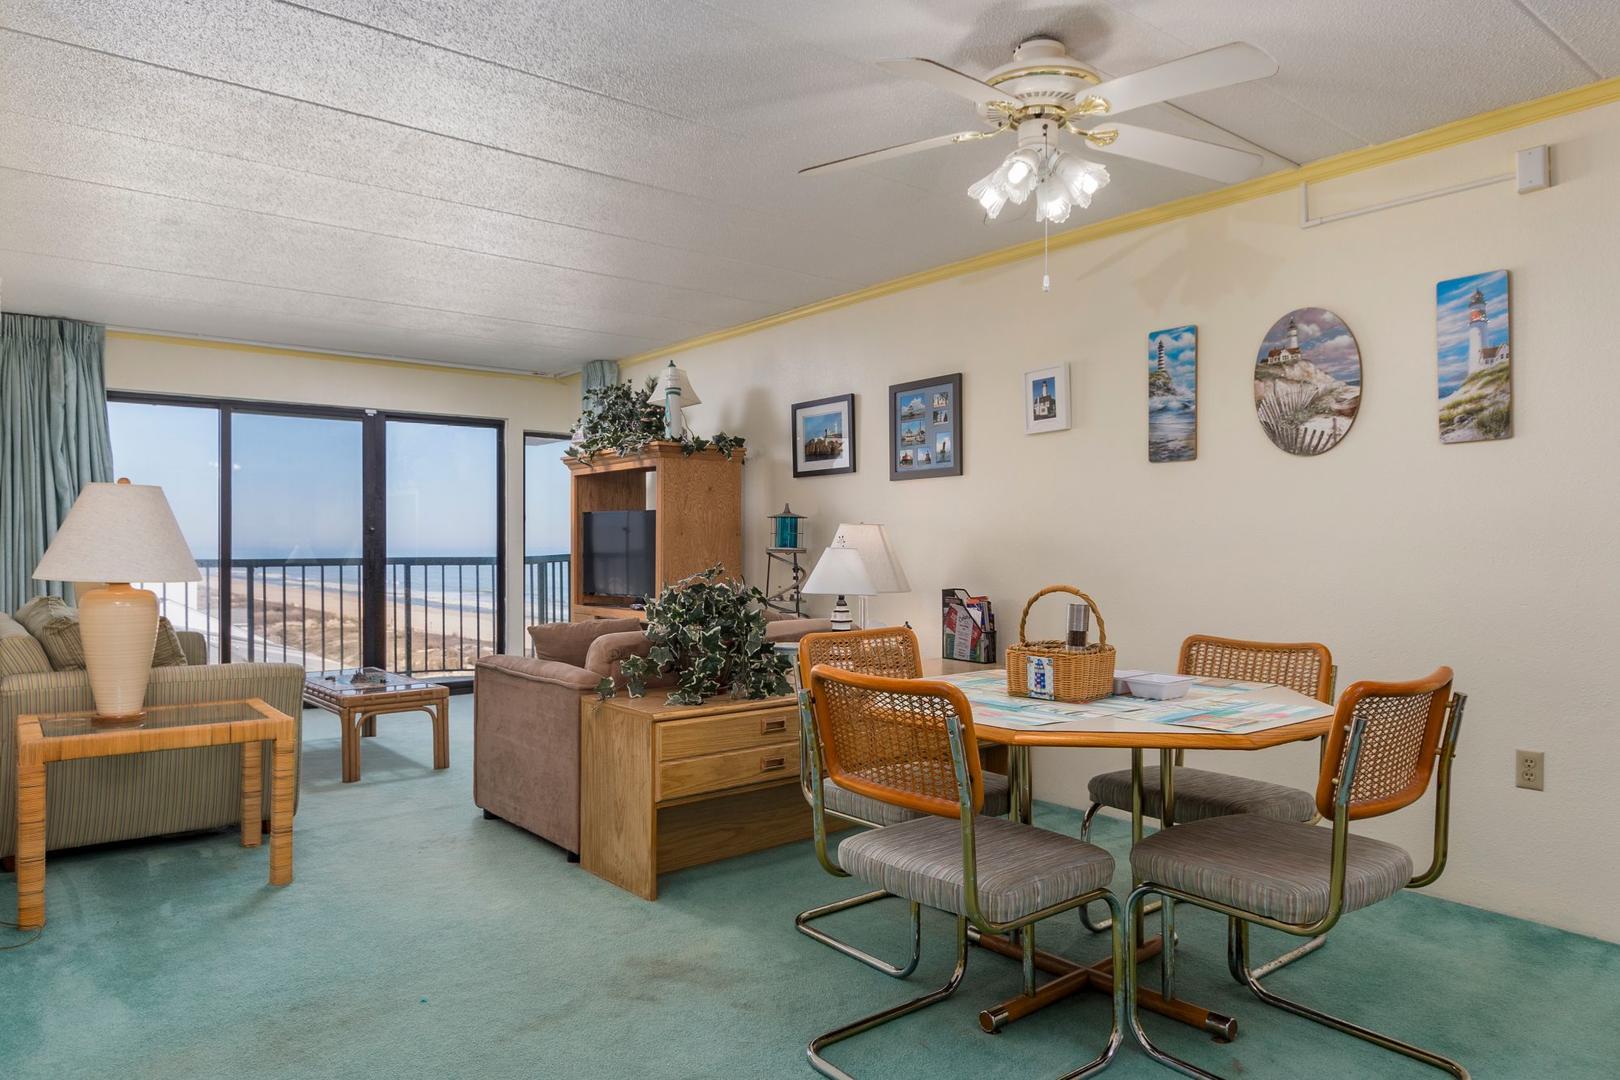 Summer Beach 605 - Dining Area